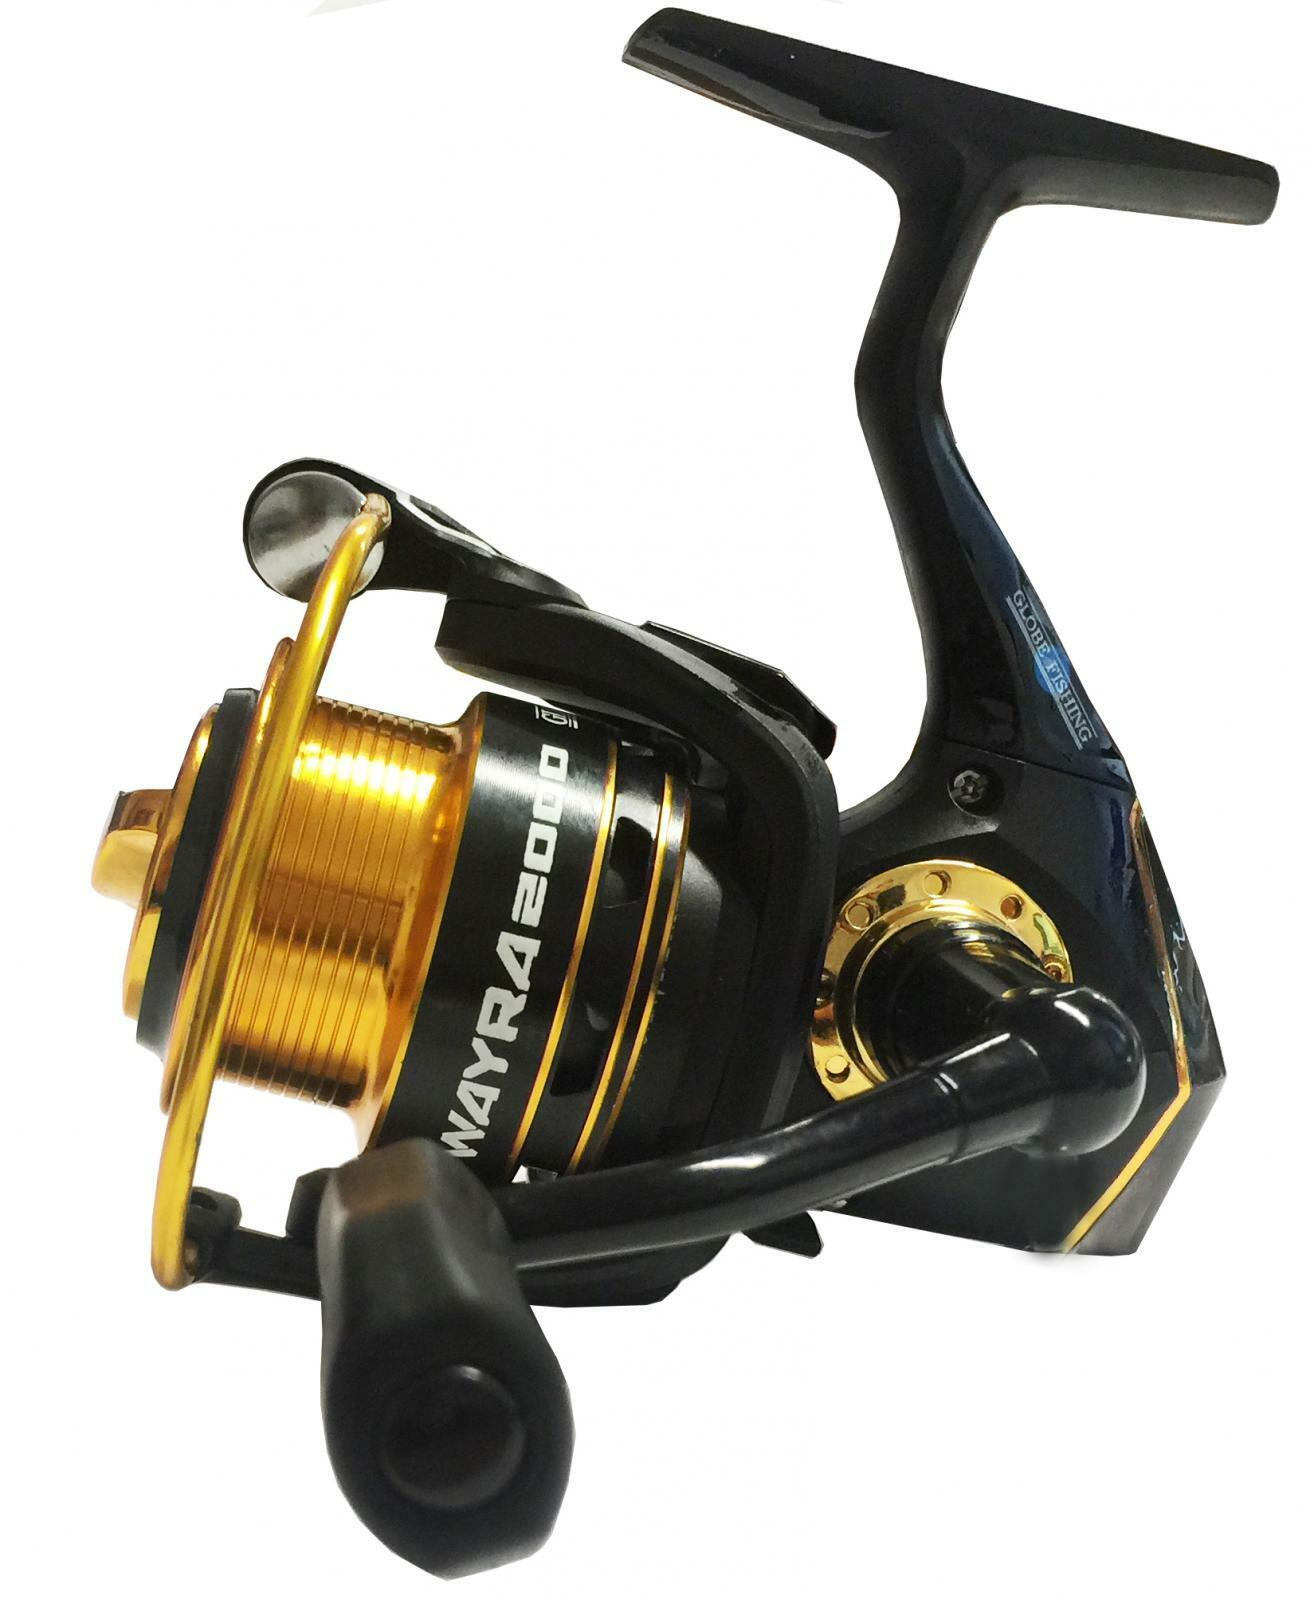 5471000 Mulinello Globe Fishing Wayra 1000 pesca Trout 7 cuscinetti CASG